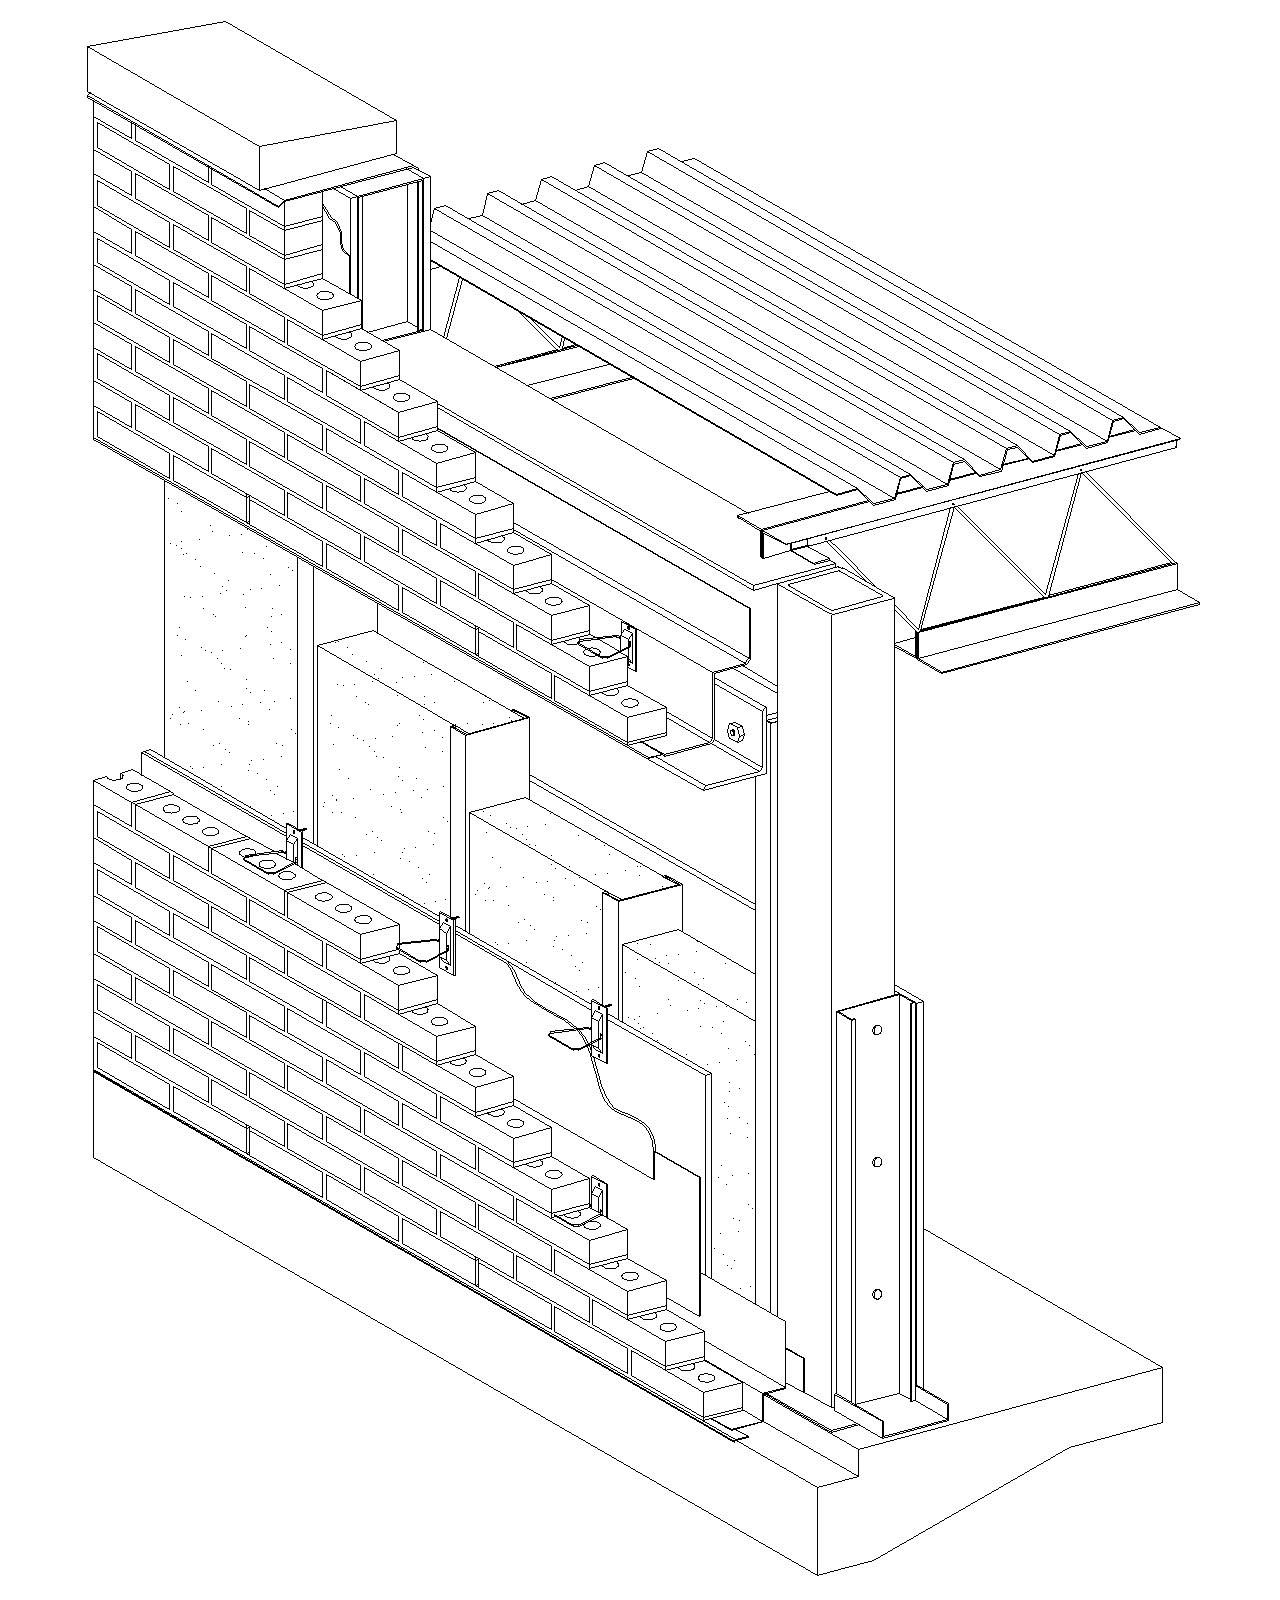 Http Www Masonrysystems Org Media Jpg Cavity Wall Brick Veneer Steel Stud Jpg Brick Veneer Wall Brick Cladding Brick Veneer